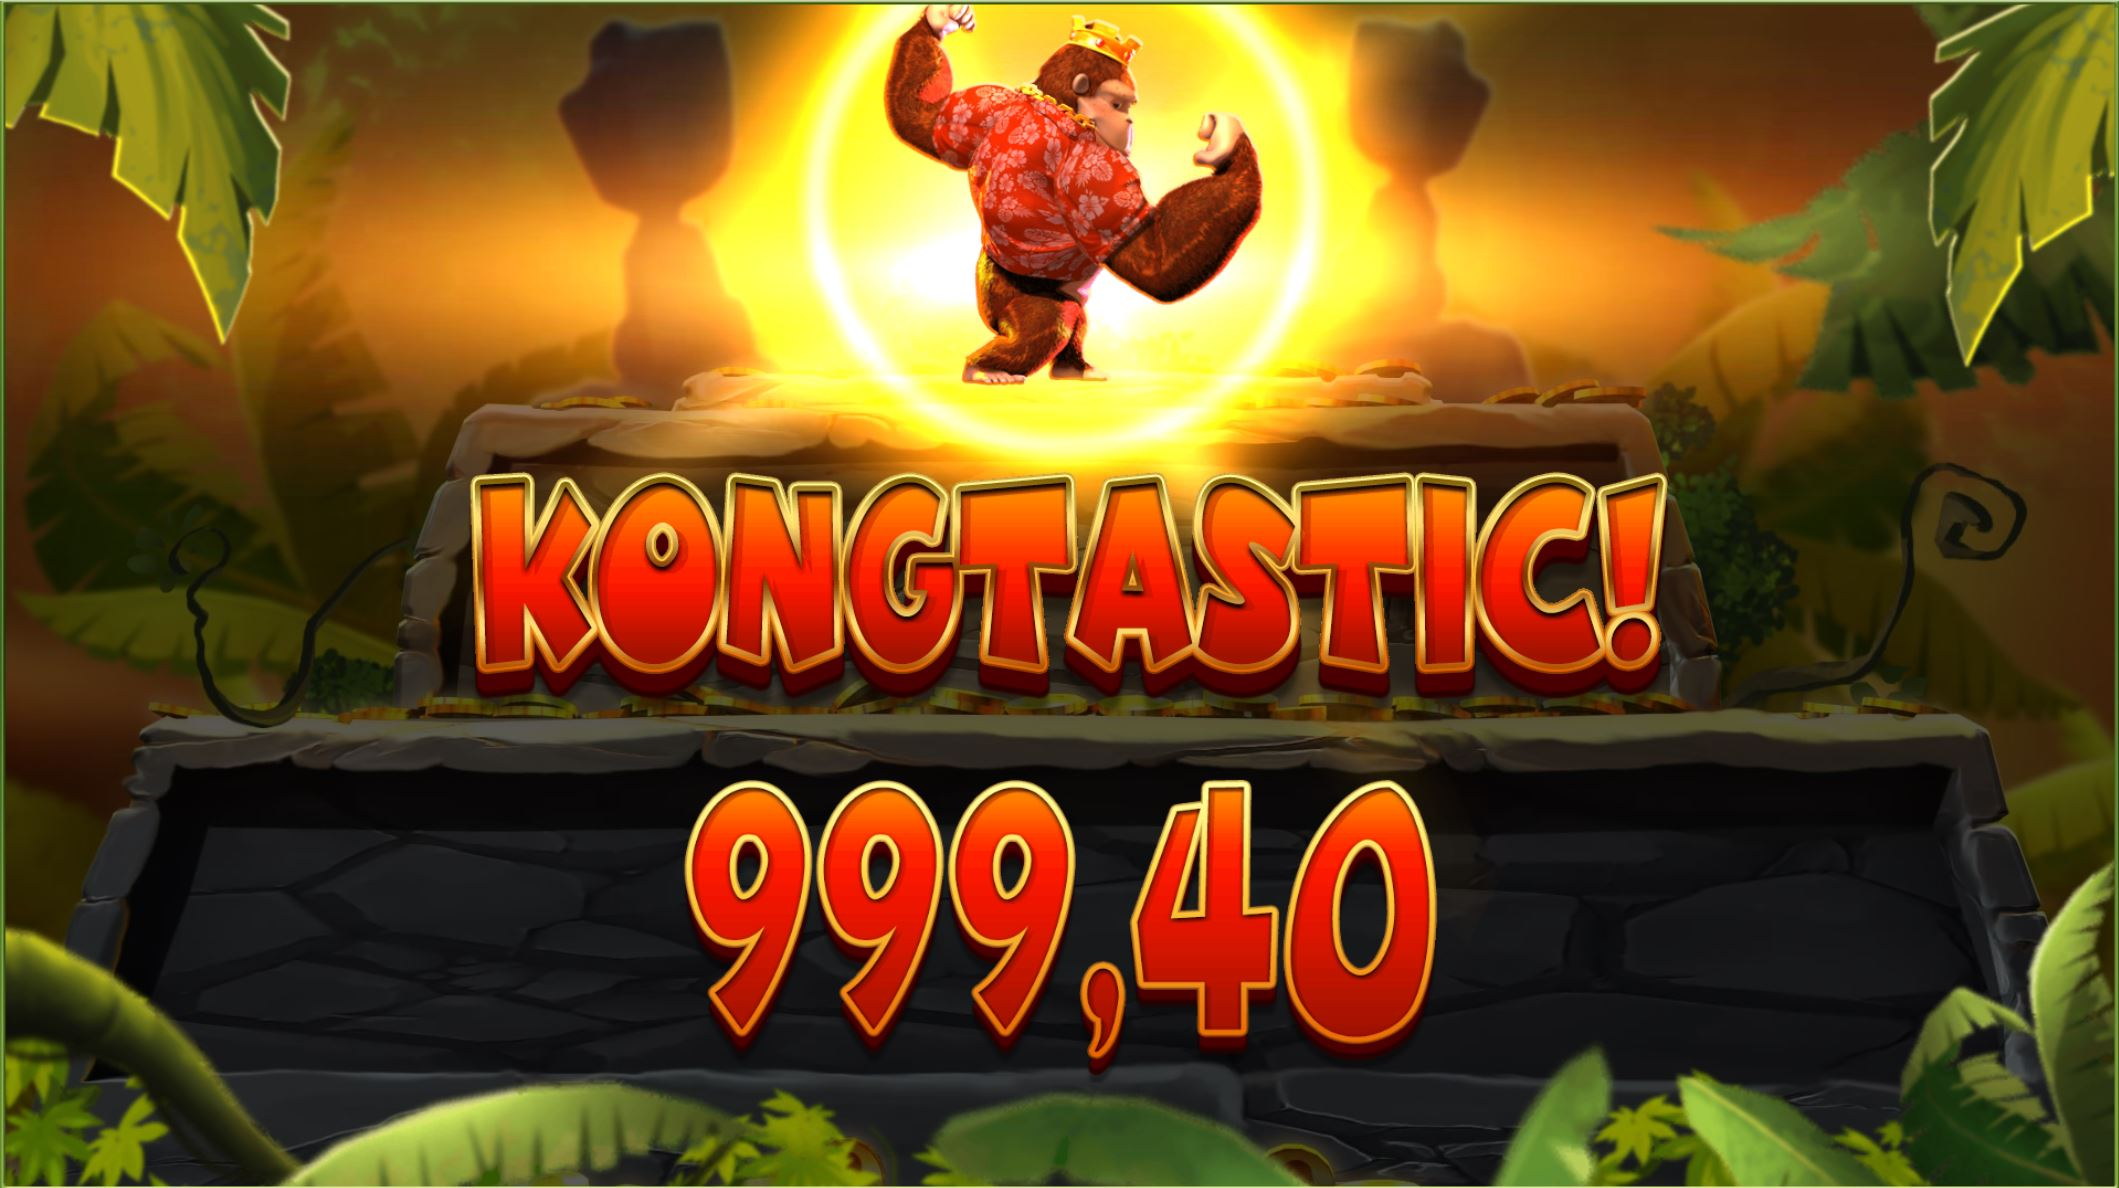 Kongtastic win